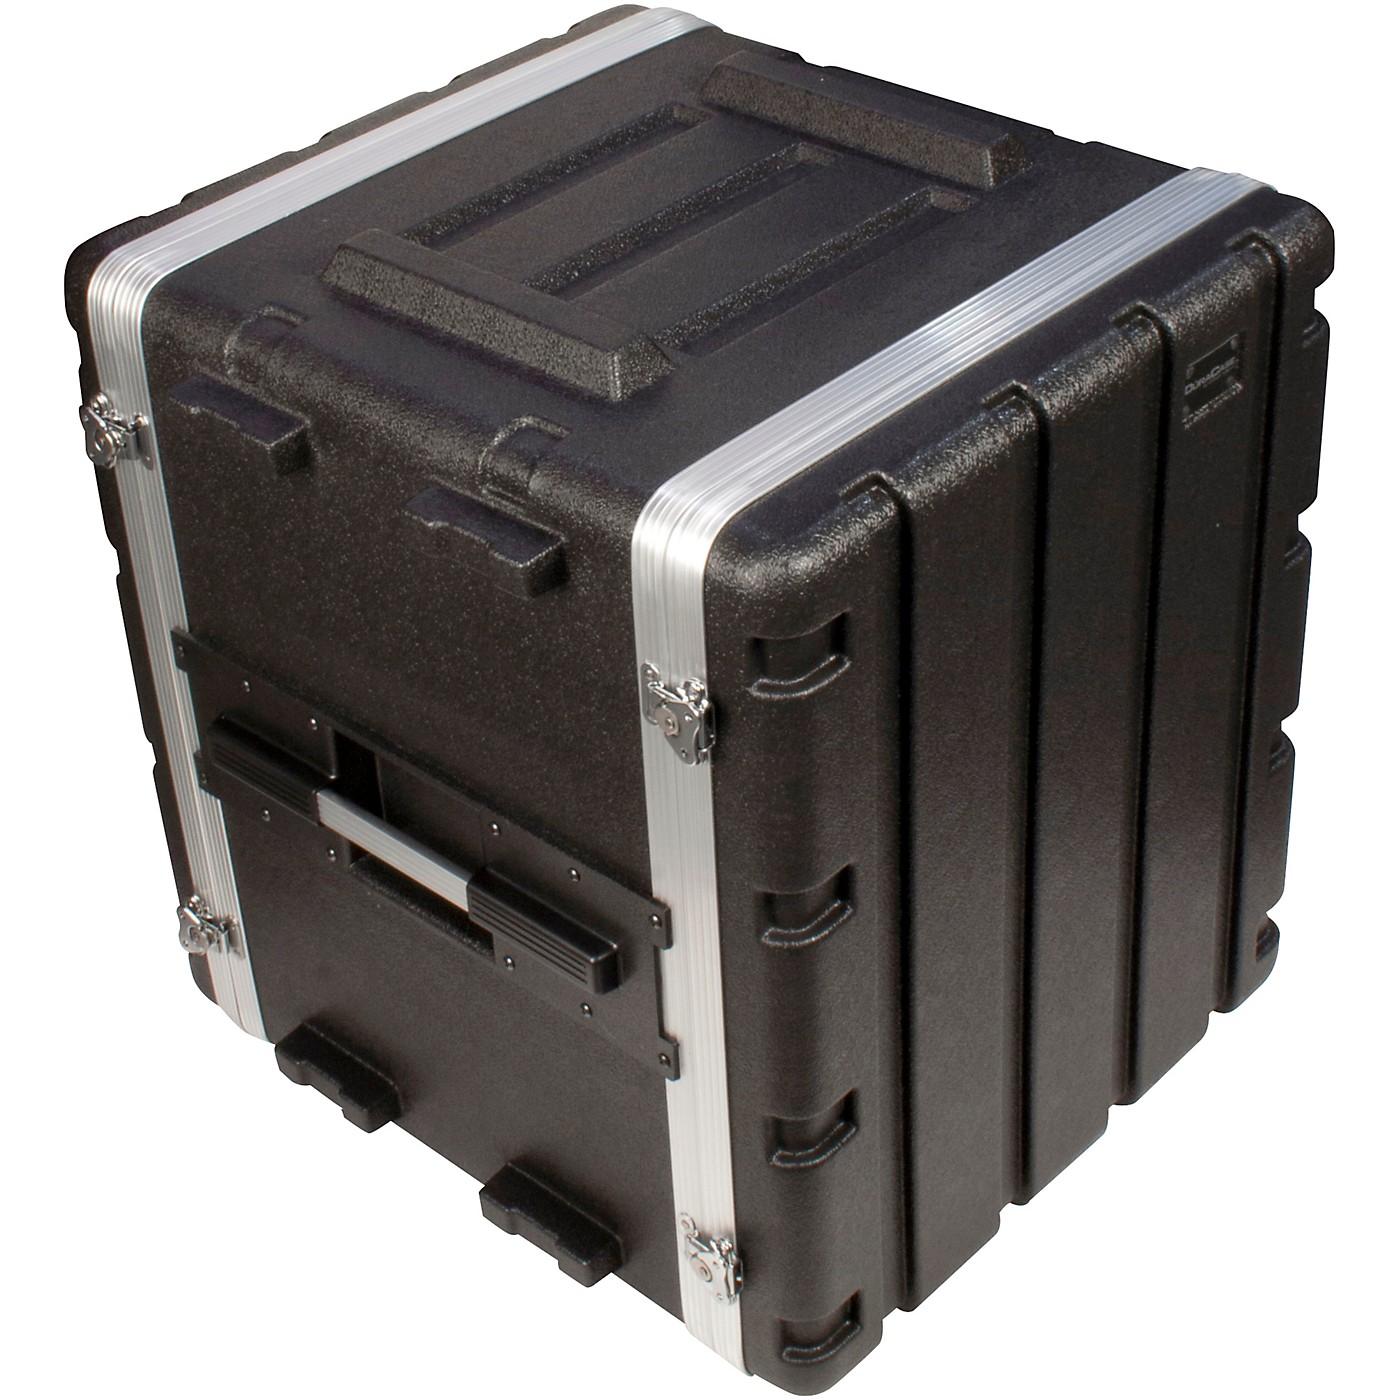 Ultimate Support DuraCase UR-12L Portable 12-Space Rackmount Case thumbnail